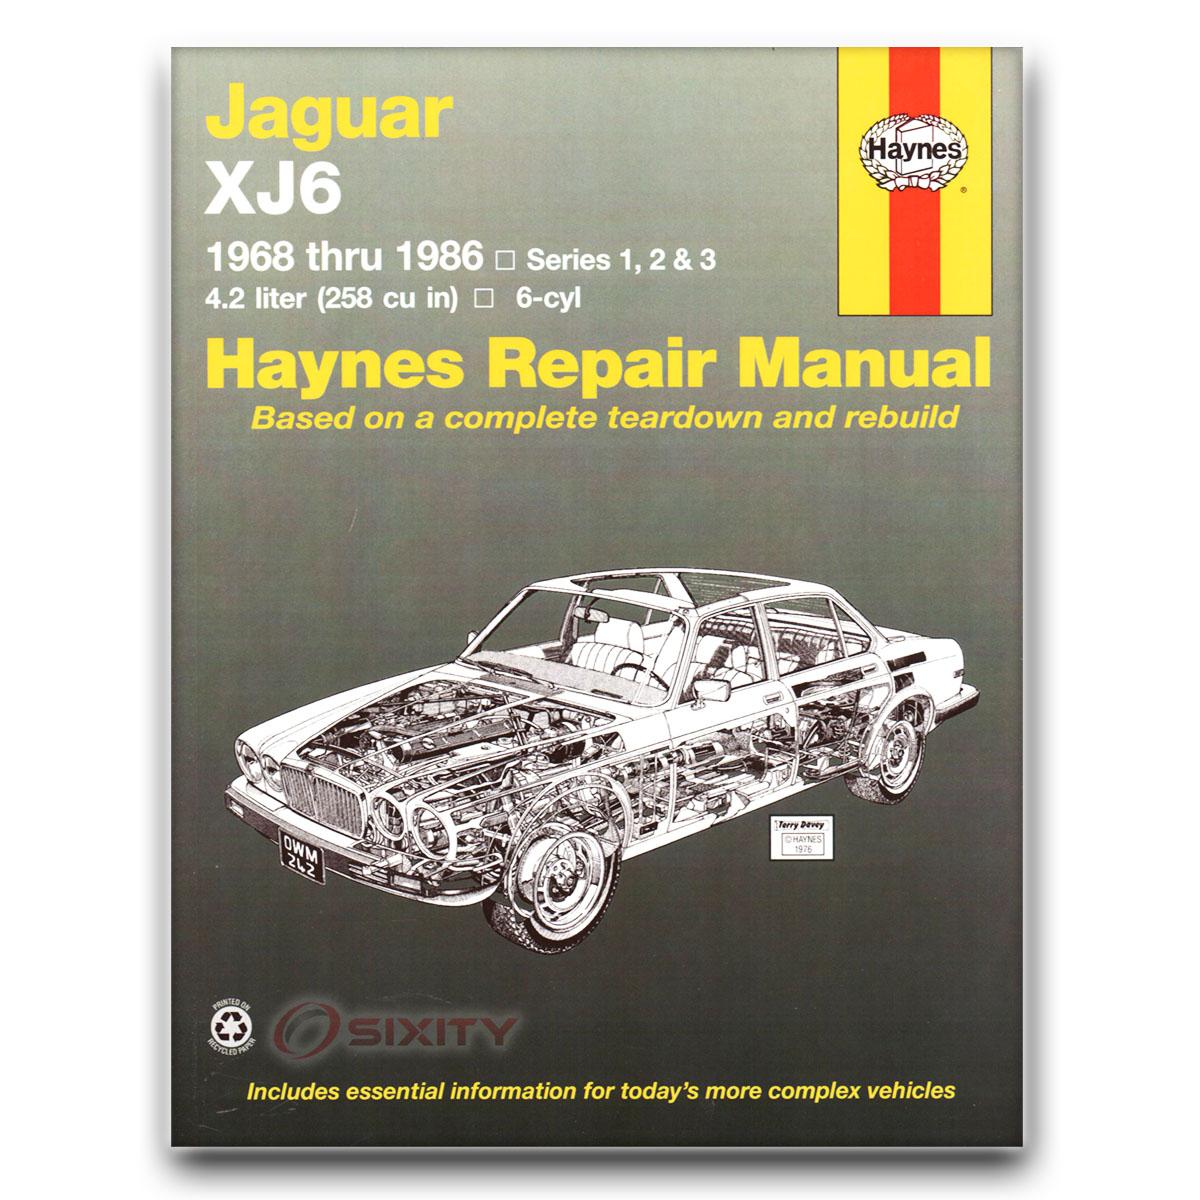 jaguar xj6 haynes repair manual l base c shop service. Black Bedroom Furniture Sets. Home Design Ideas